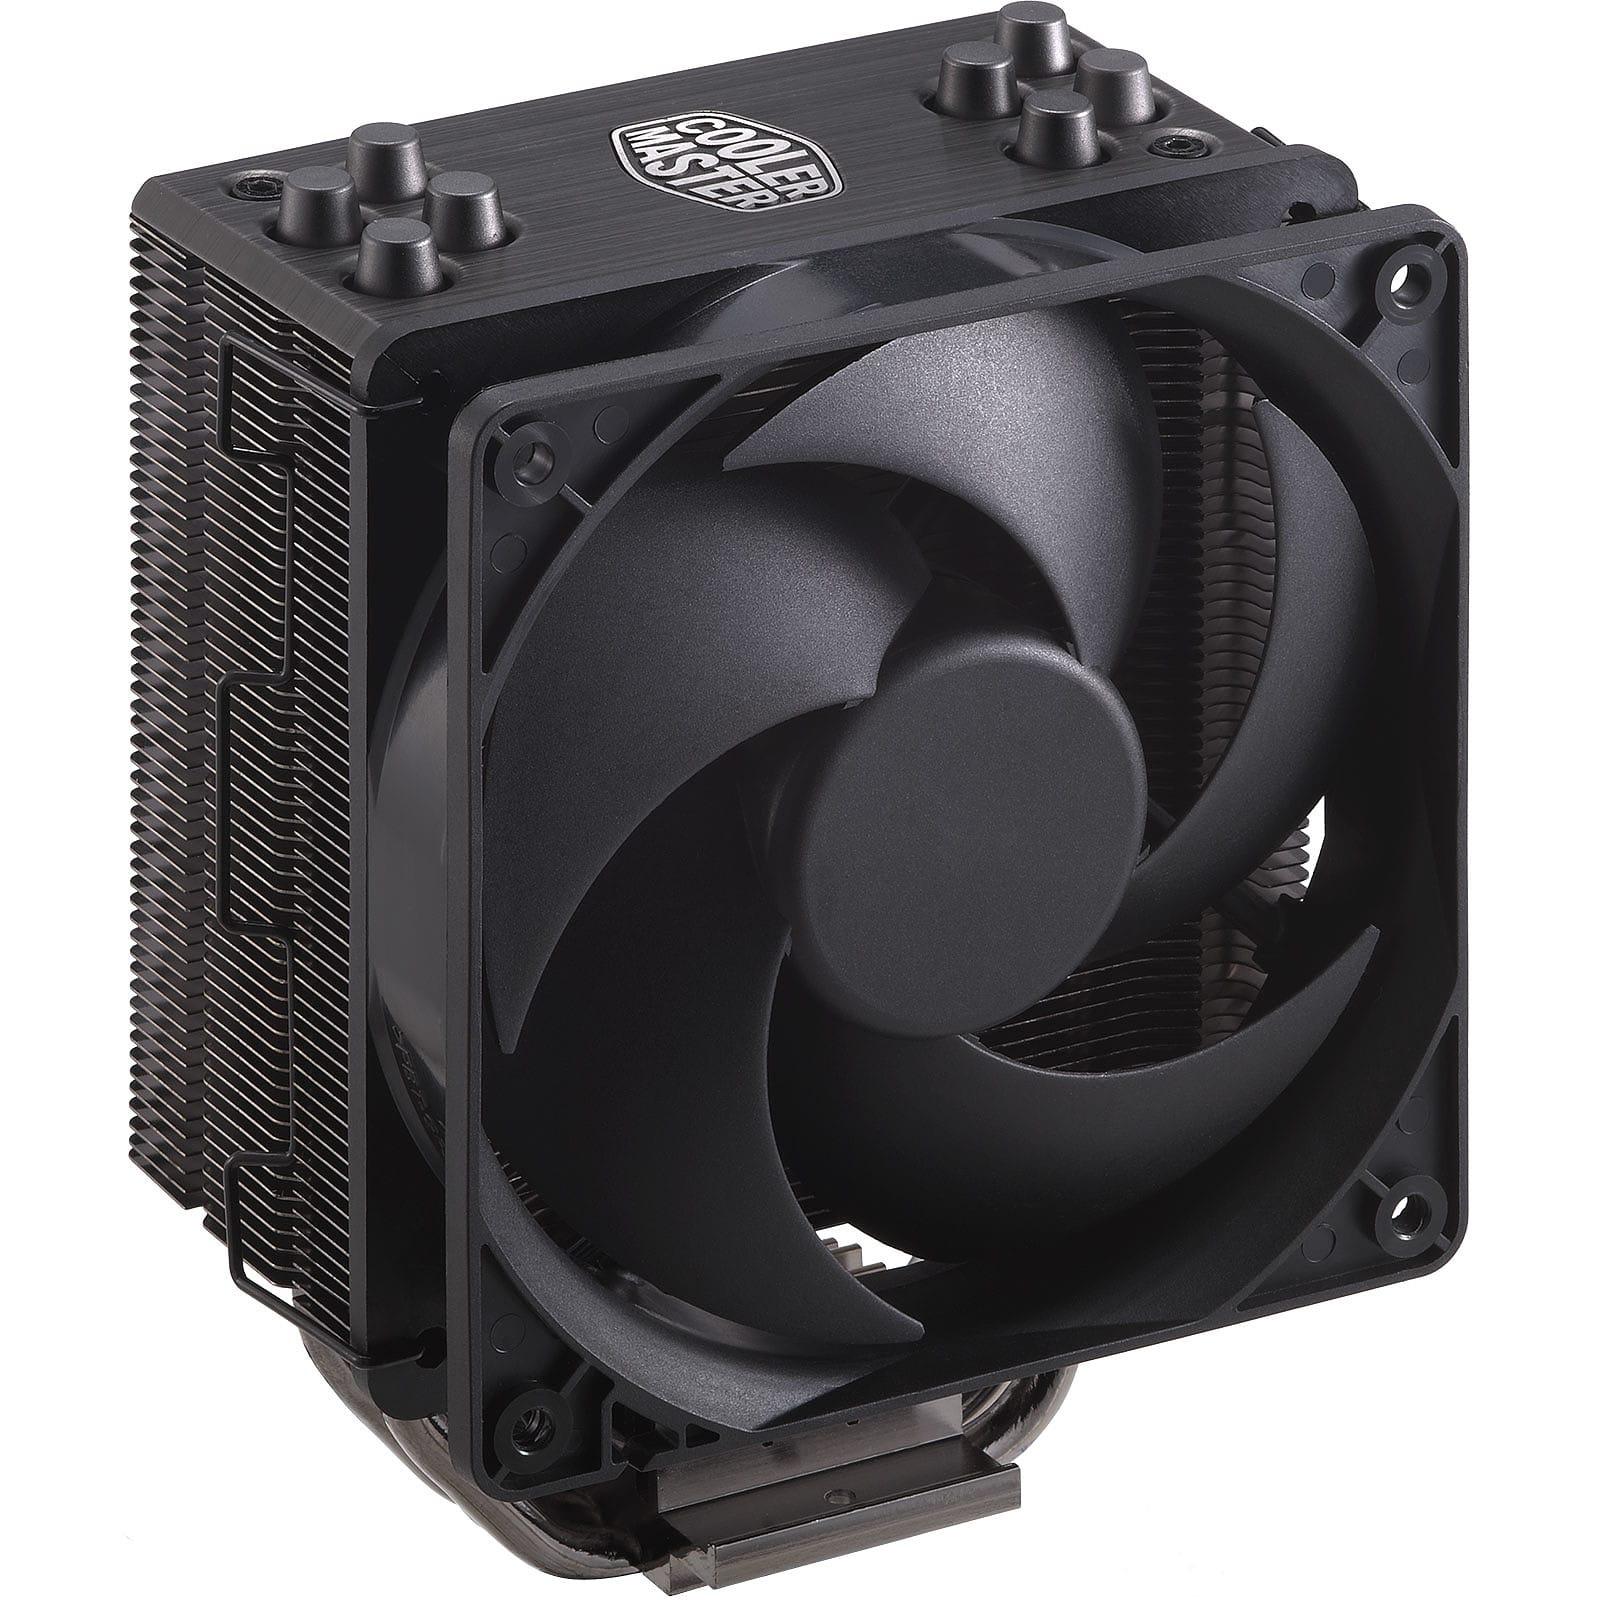 Vnetirad Cooler Master Hyper 212 Black Edition option refroidissement PC Gamer Apex Legends